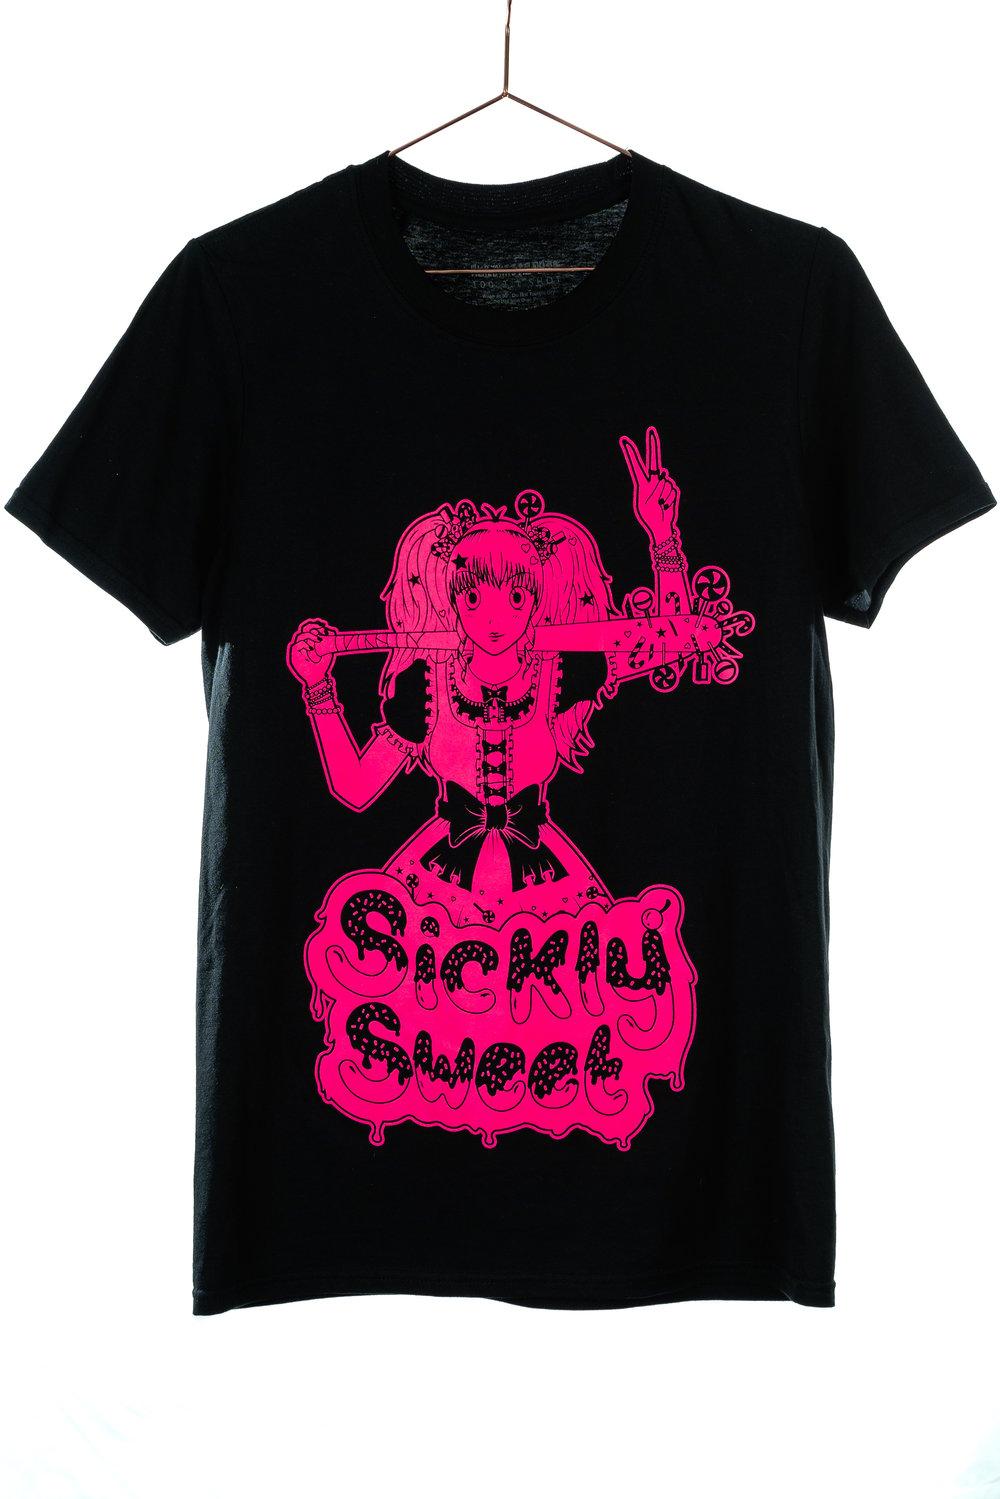 Sickly Sweet Neon Unisex Anime T-Shirt